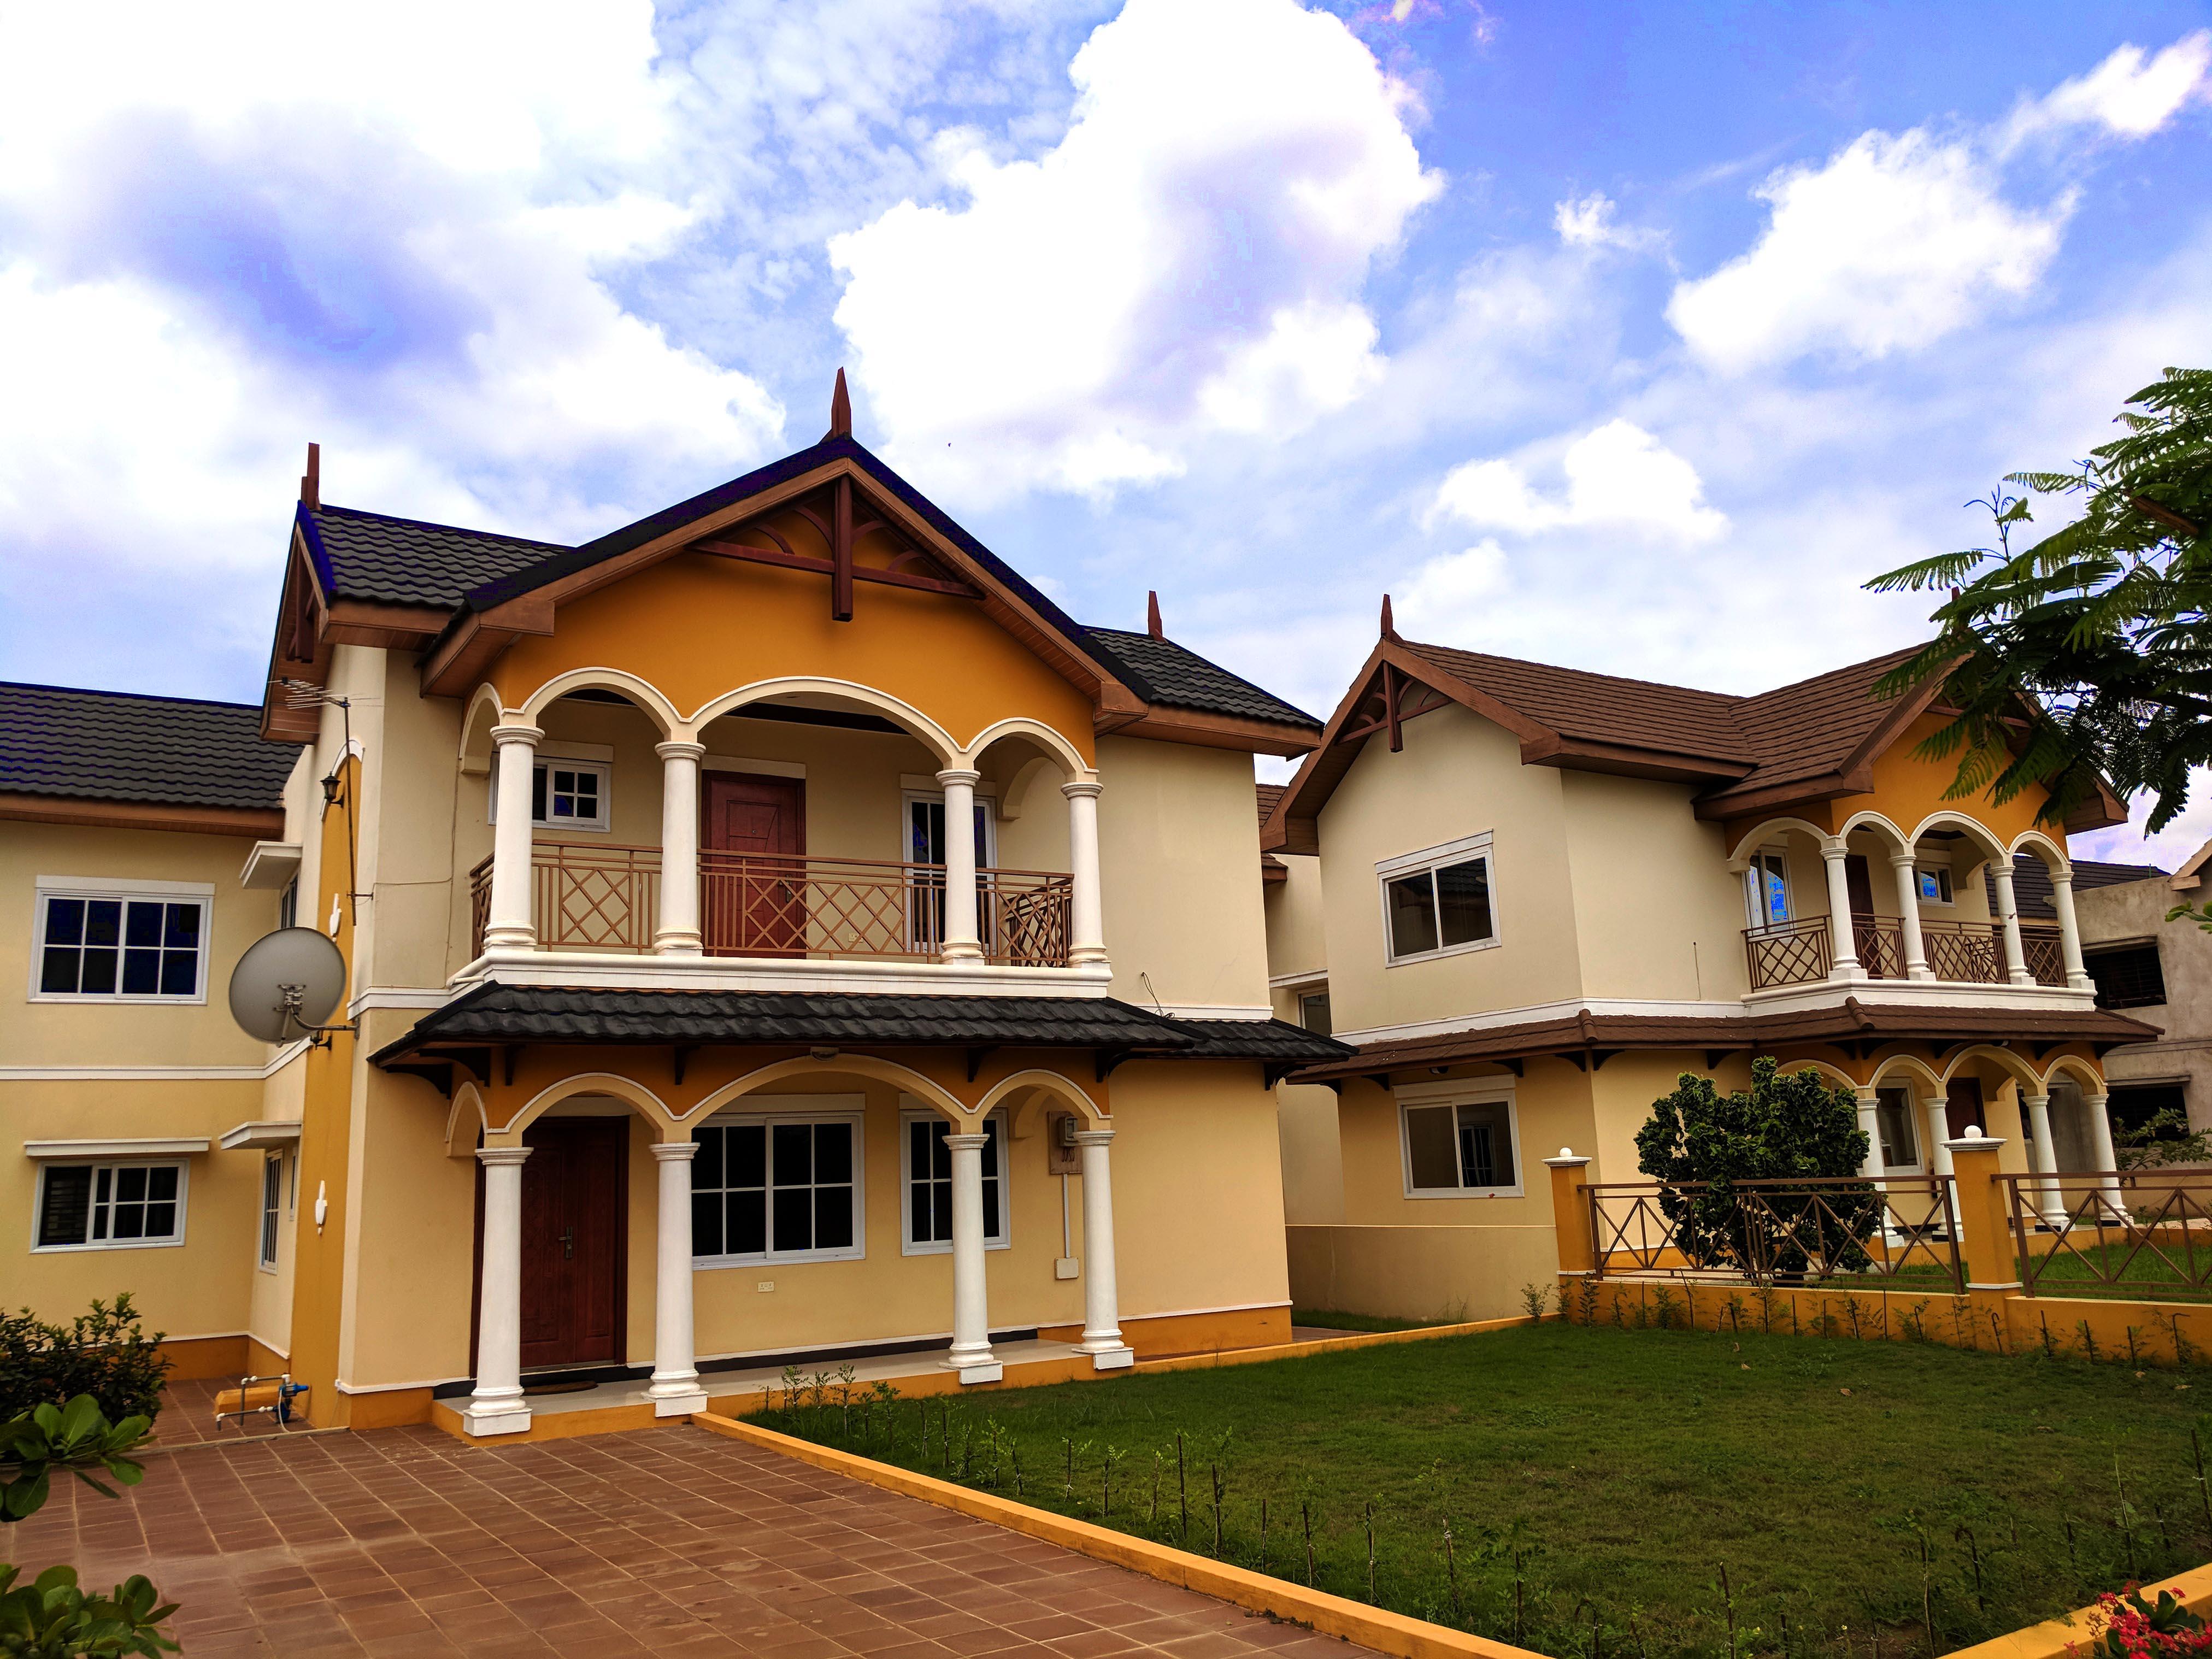 Paradise Estate by real estate developer Swami India at East Legon Hills